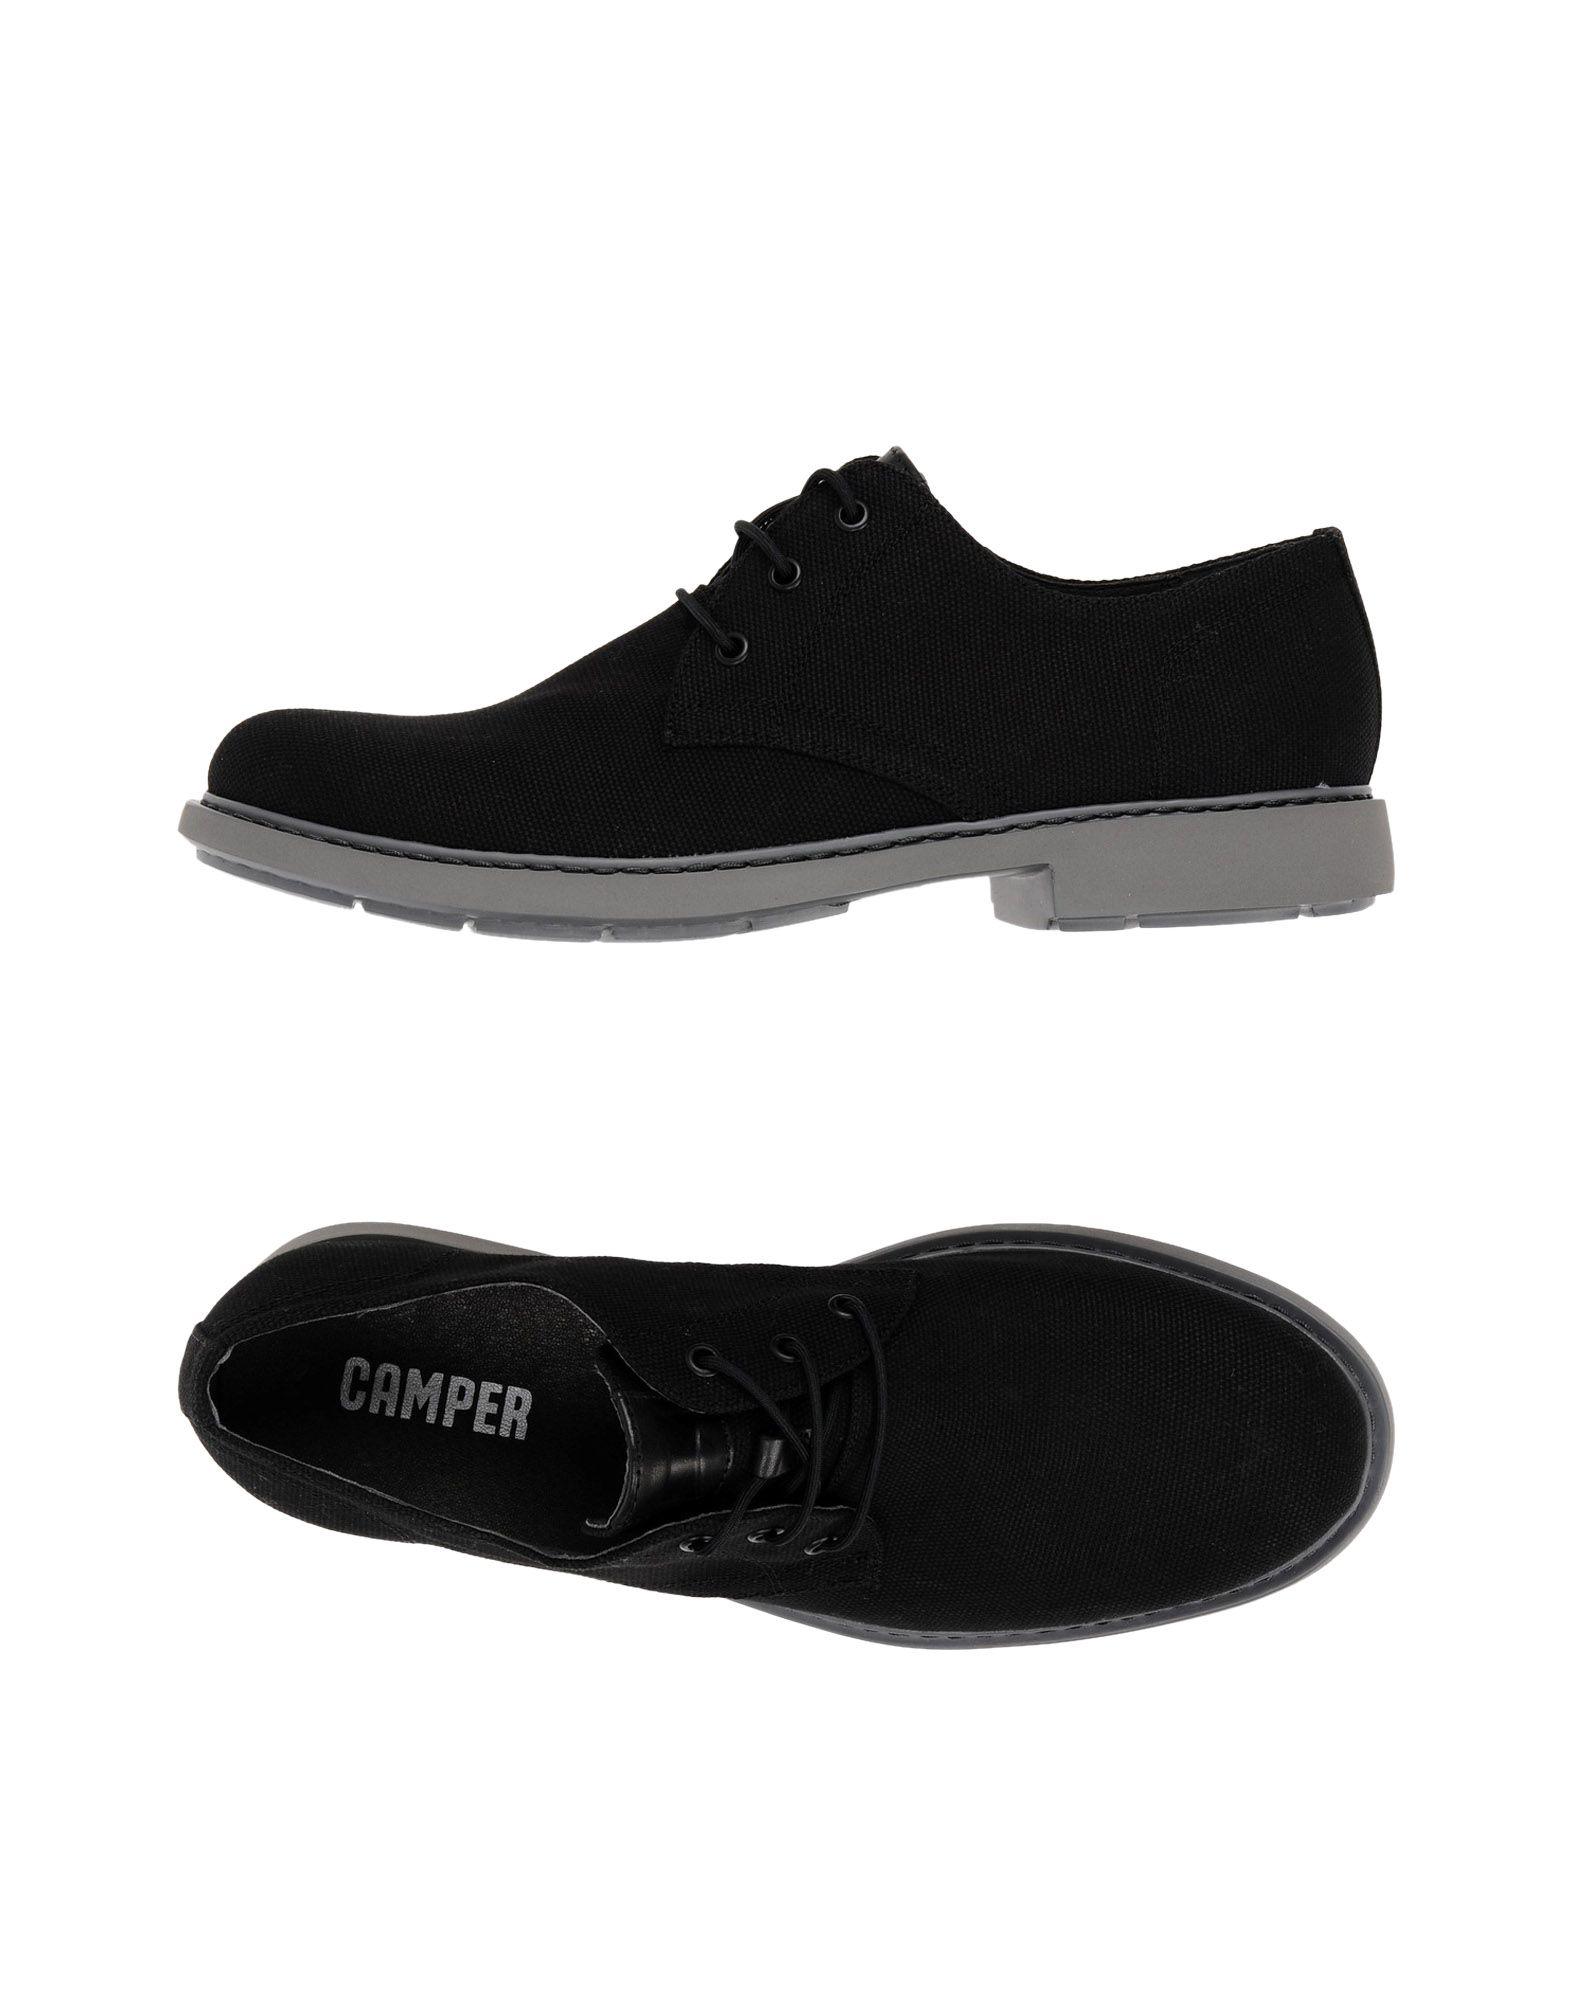 CAMPER Обувь на шнурках первый внутри обувь обувь обувь обувь обувь обувь обувь обувь обувь 8a2549 мужская армия green 40 метров